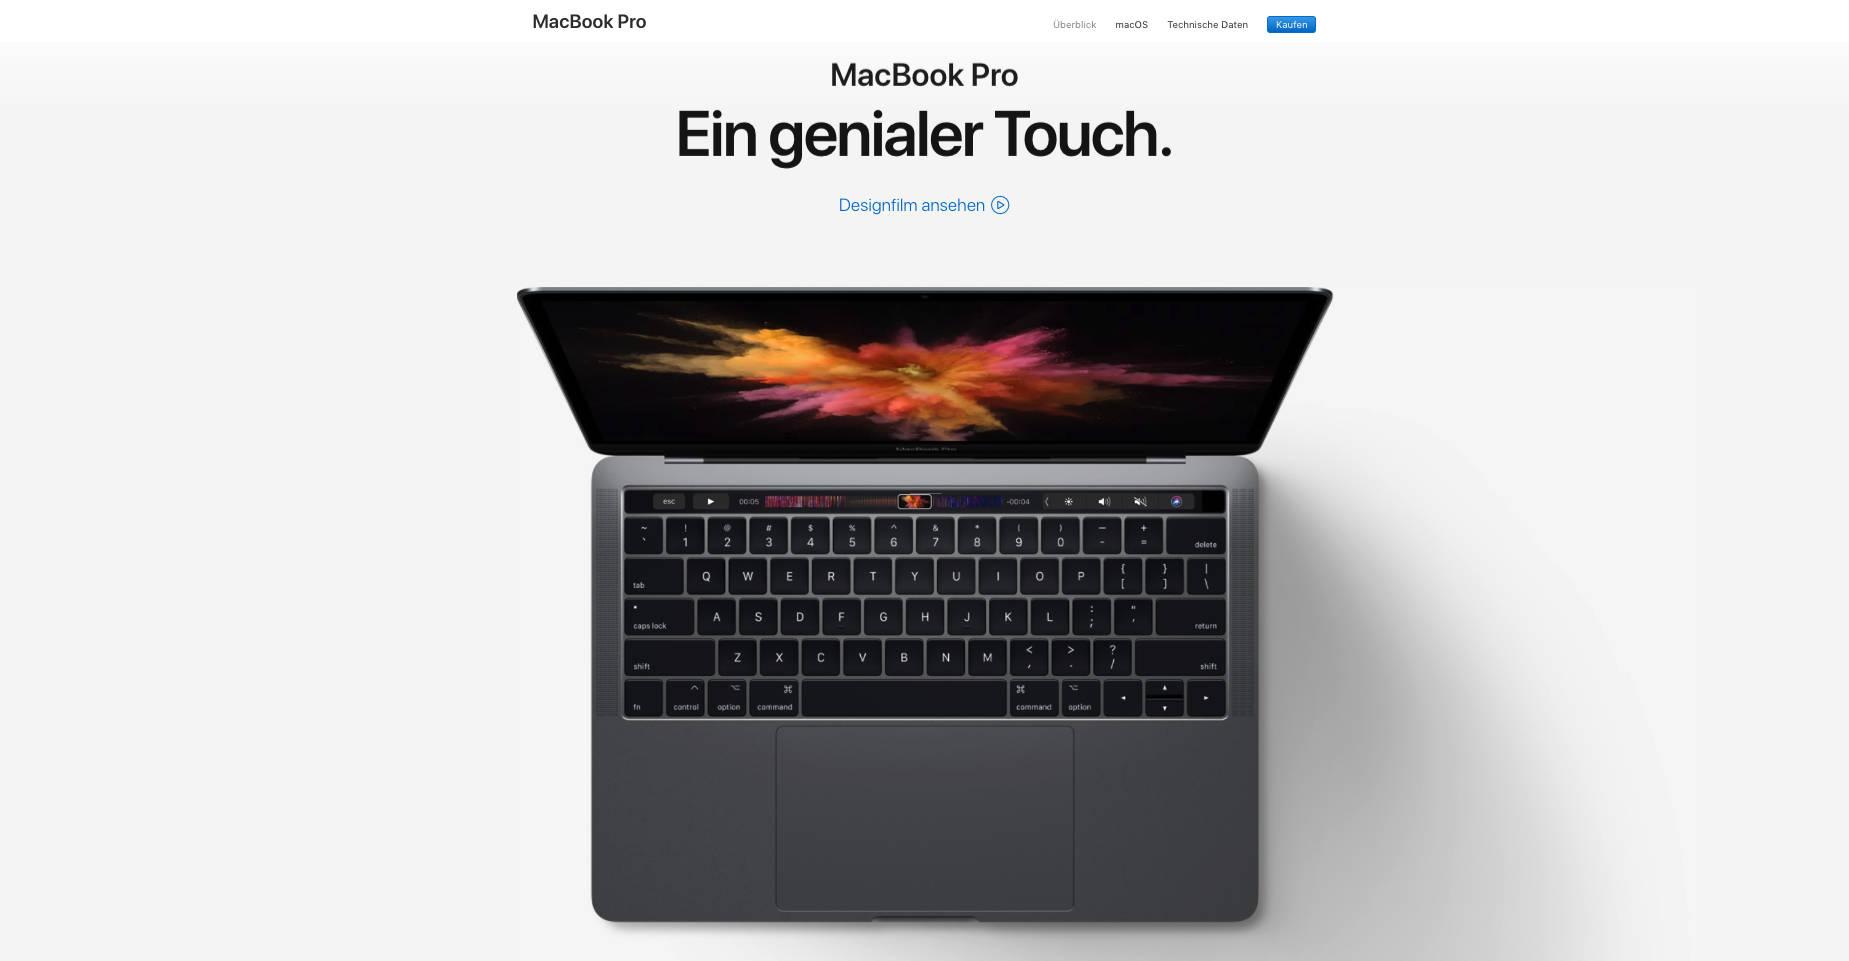 Macbook Pro Landing Page